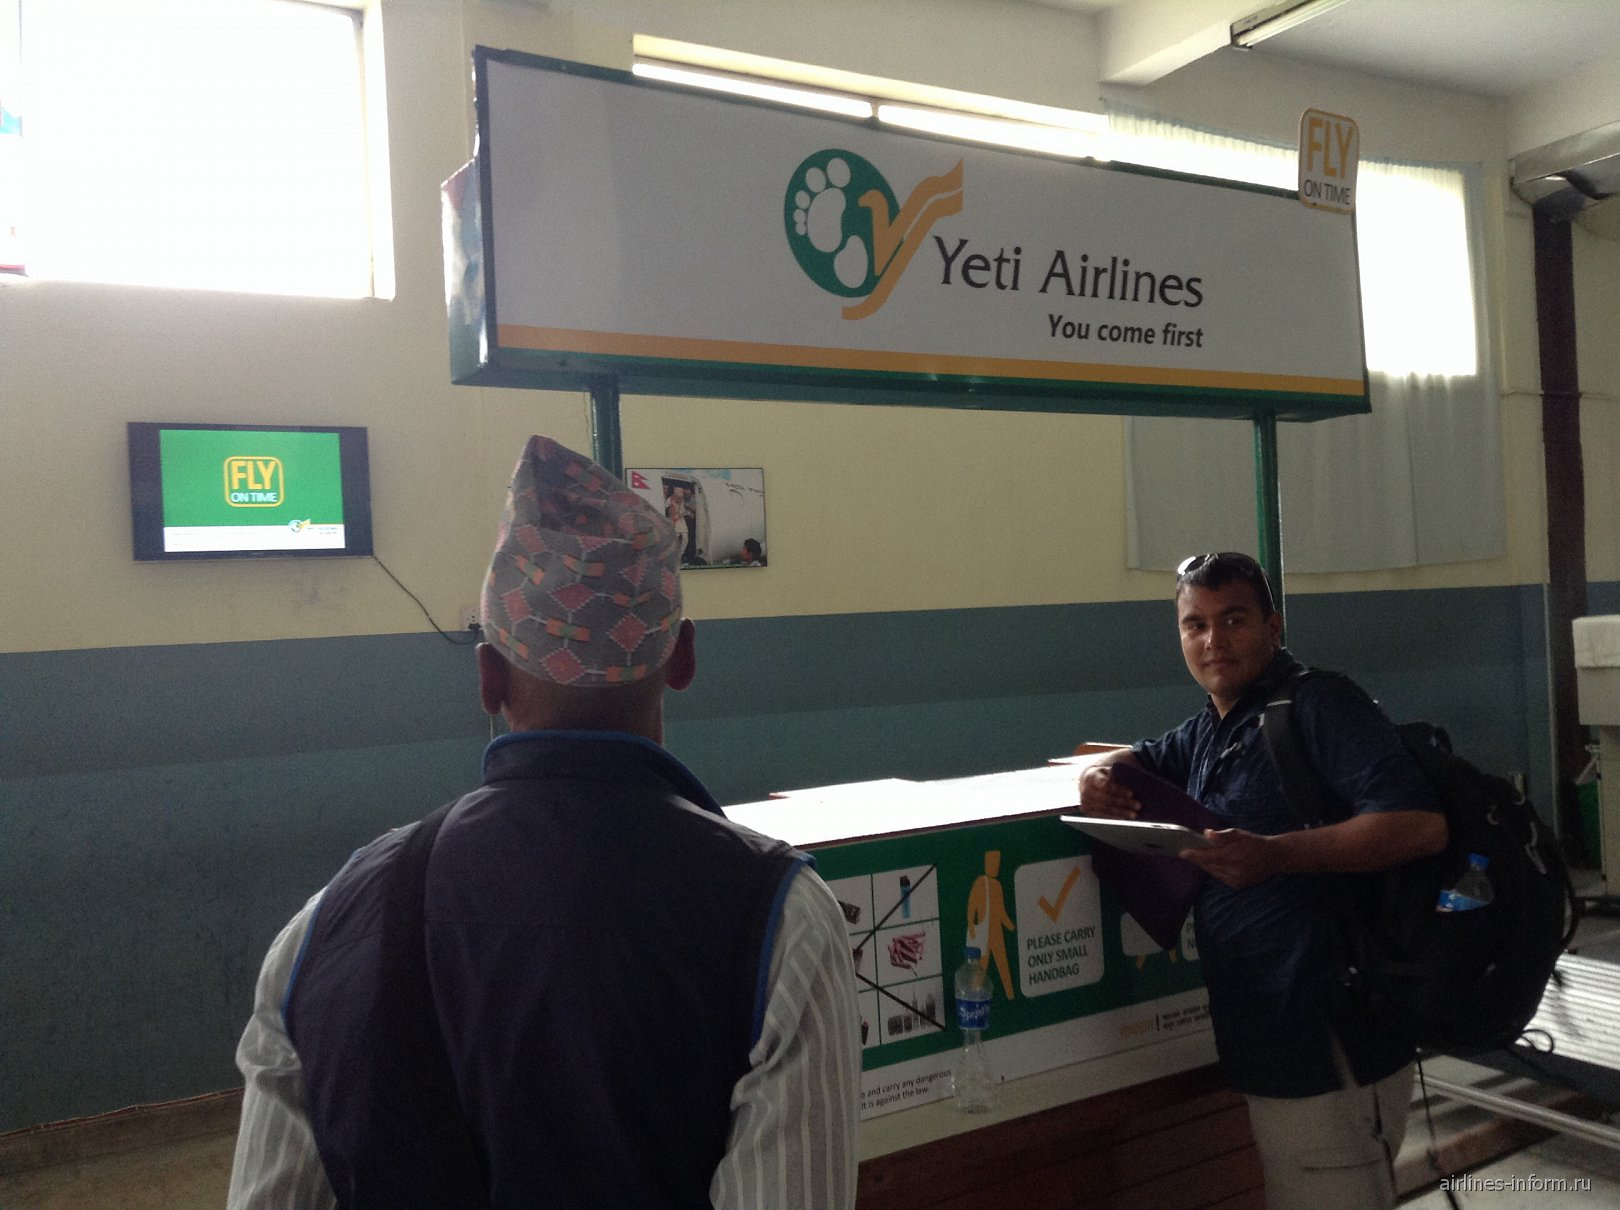 Стойка Yeti Airlines